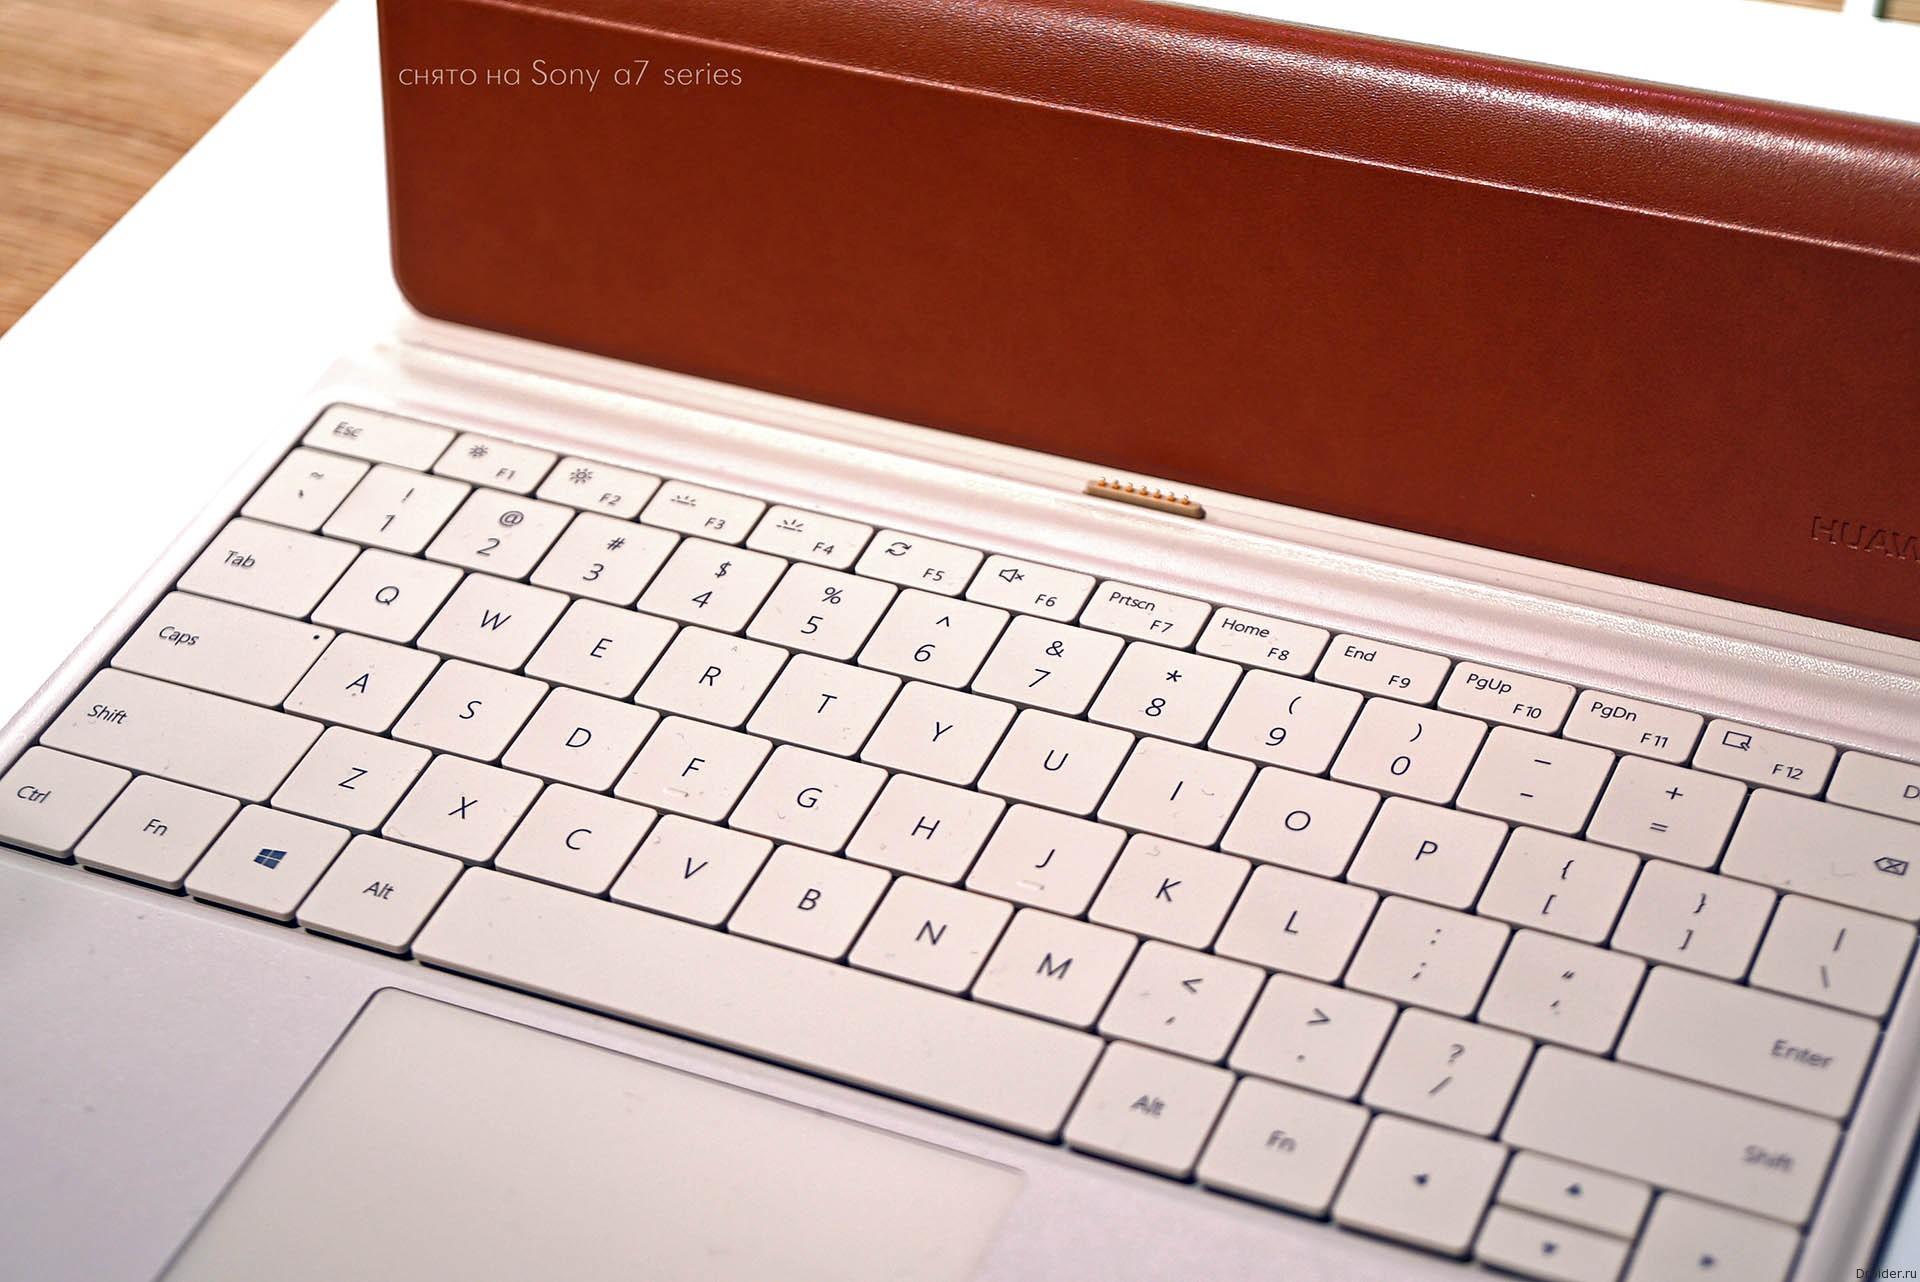 Mate Keyboard